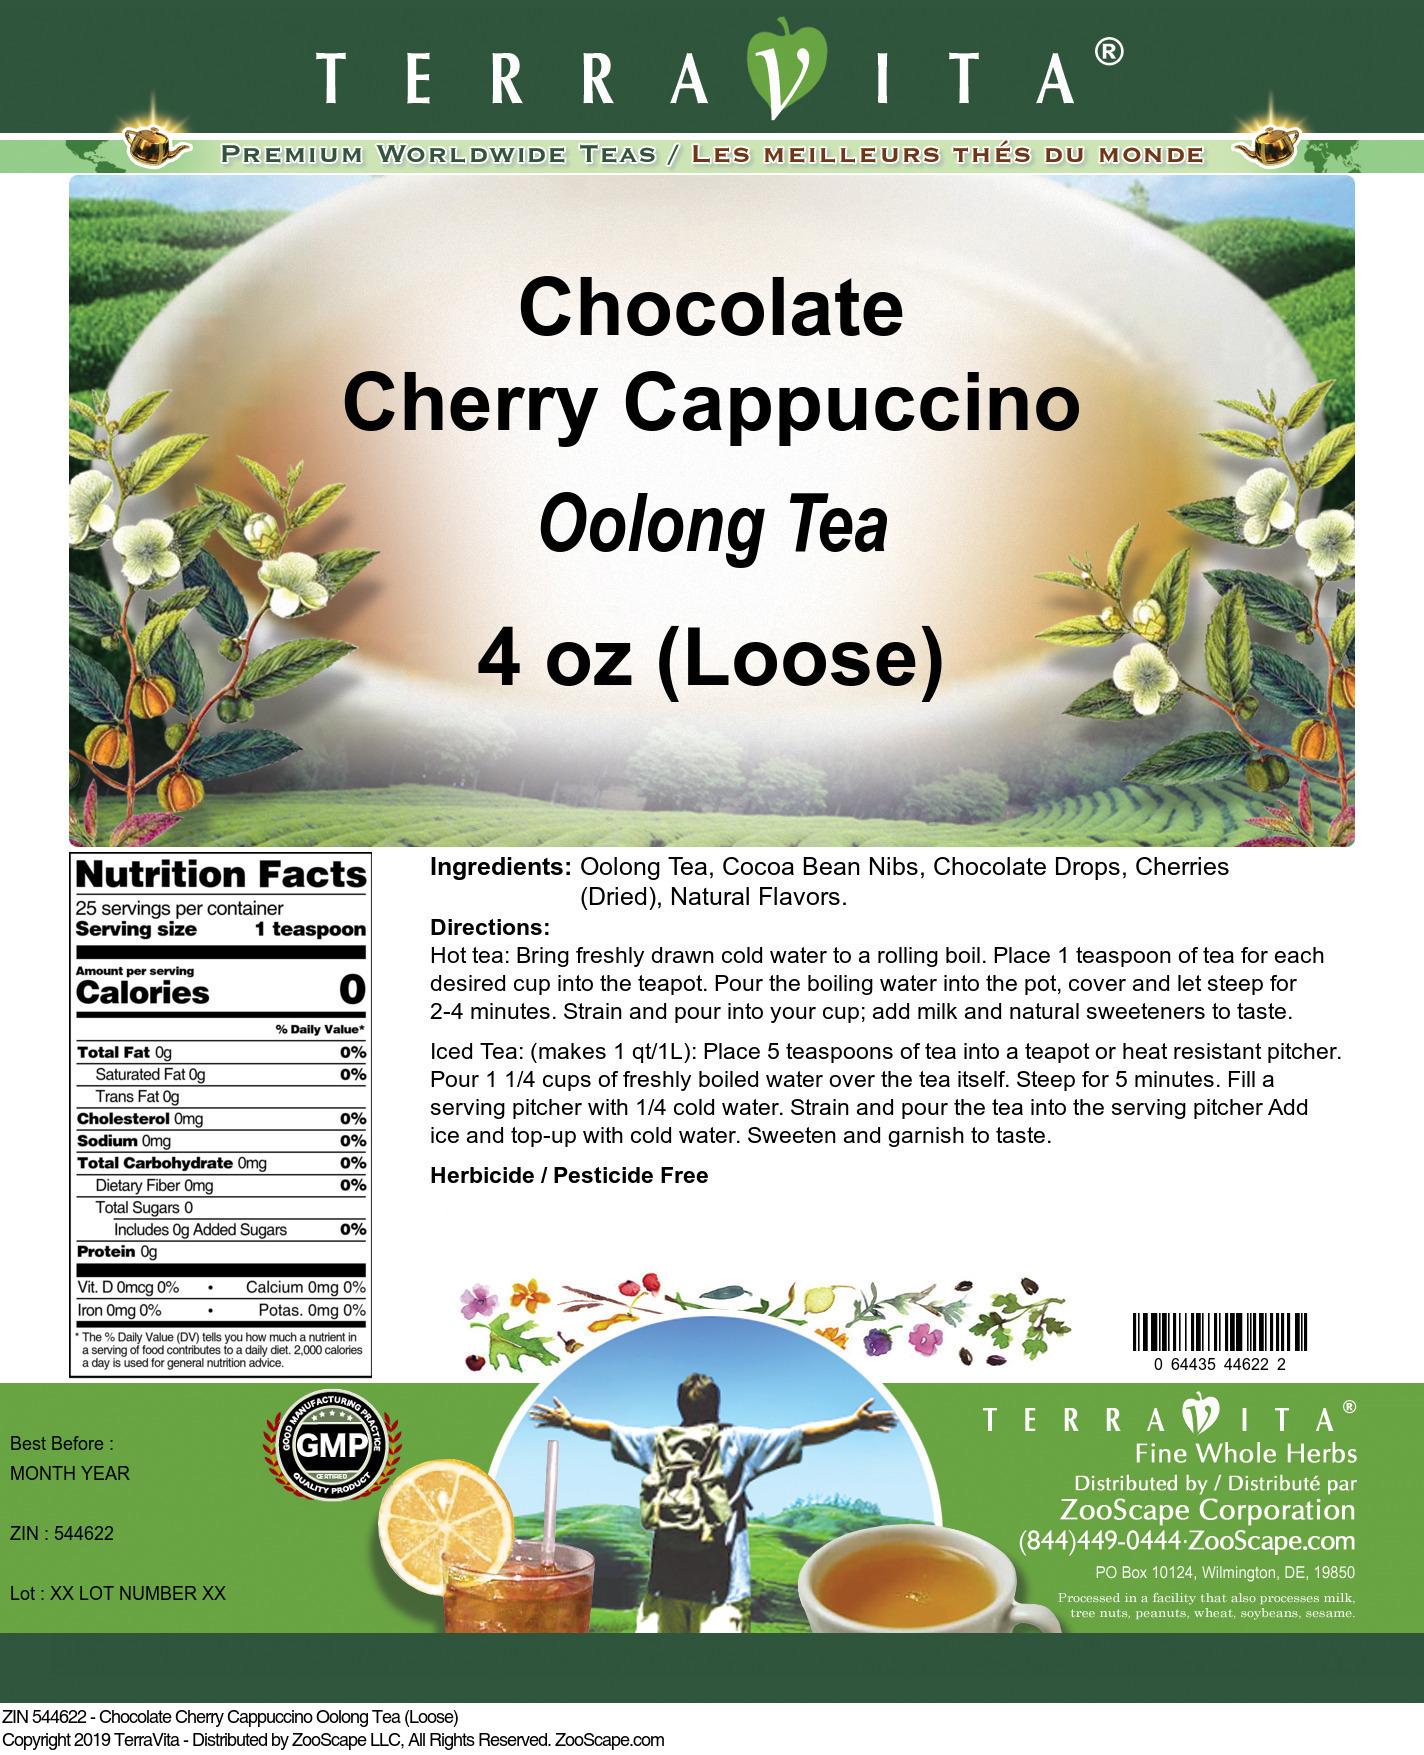 Chocolate Cherry Cappuccino Oolong Tea (Loose)